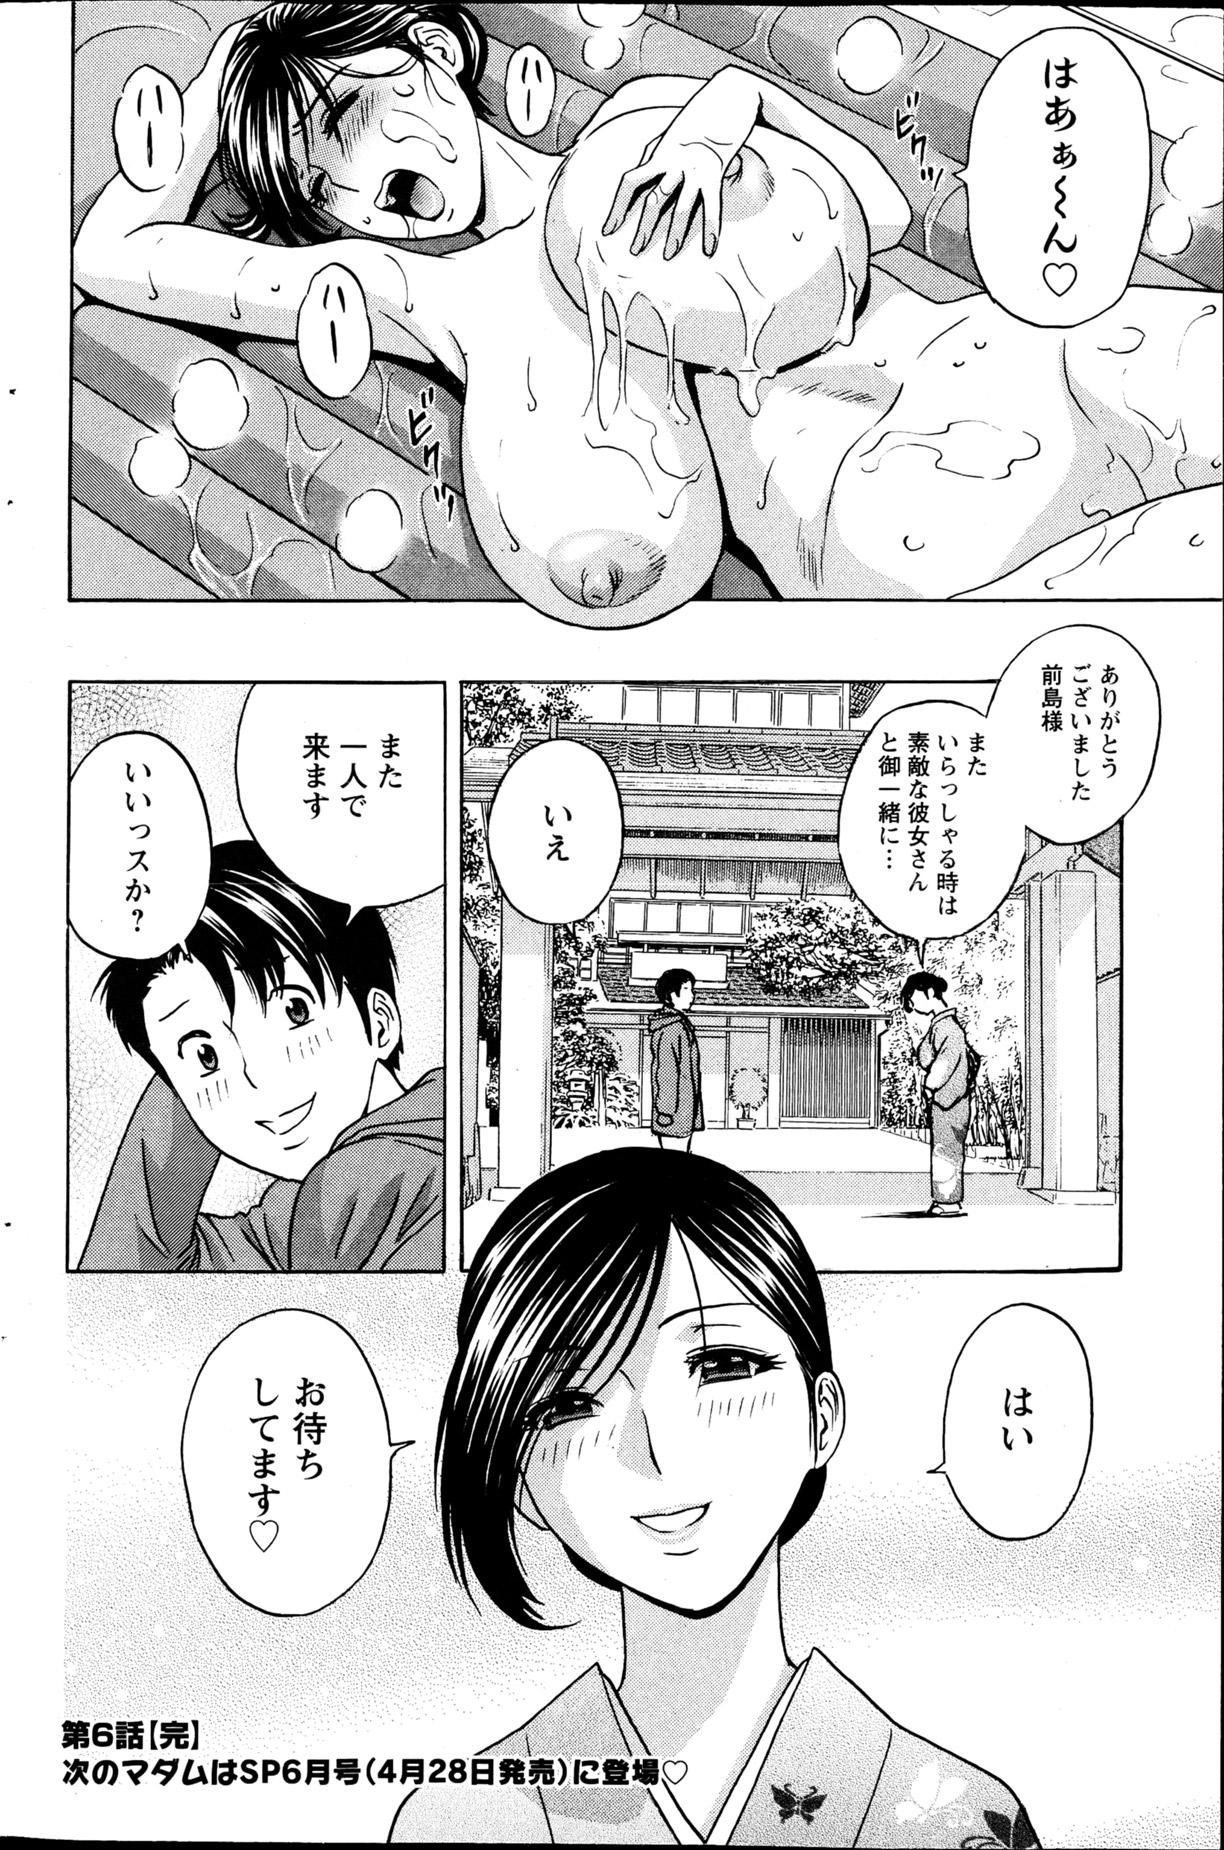 Hidemaru Nyuukan Madam Special 36